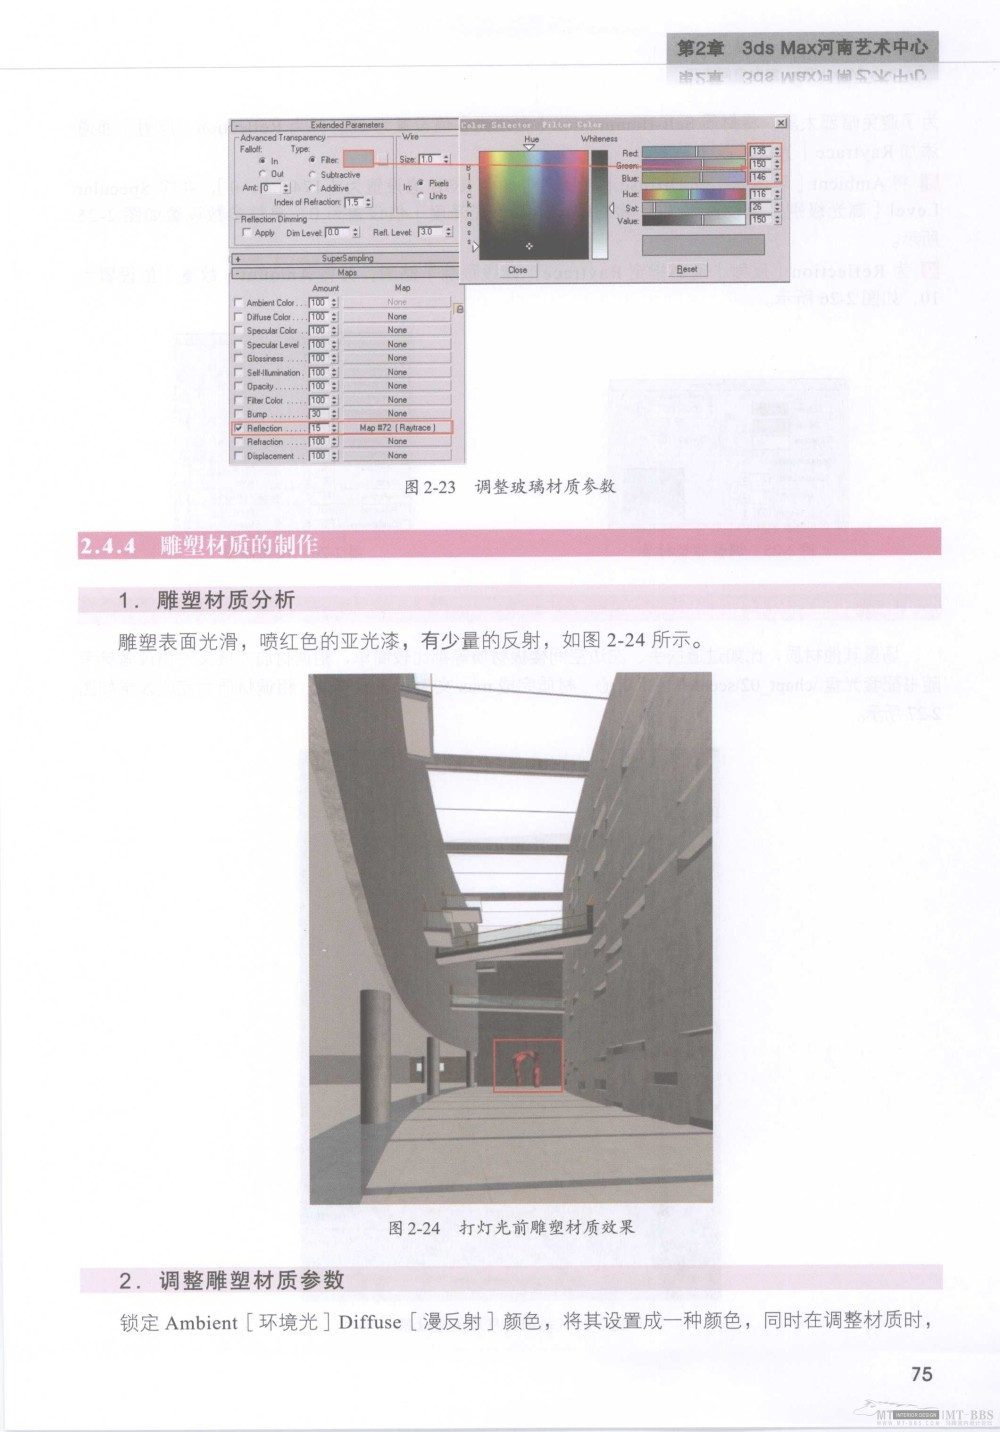 水晶石技法-3ds_Max&VRay室内空间表现_水晶石技法-3ds_Max&VRay室内空间表现_页面_081.jpg